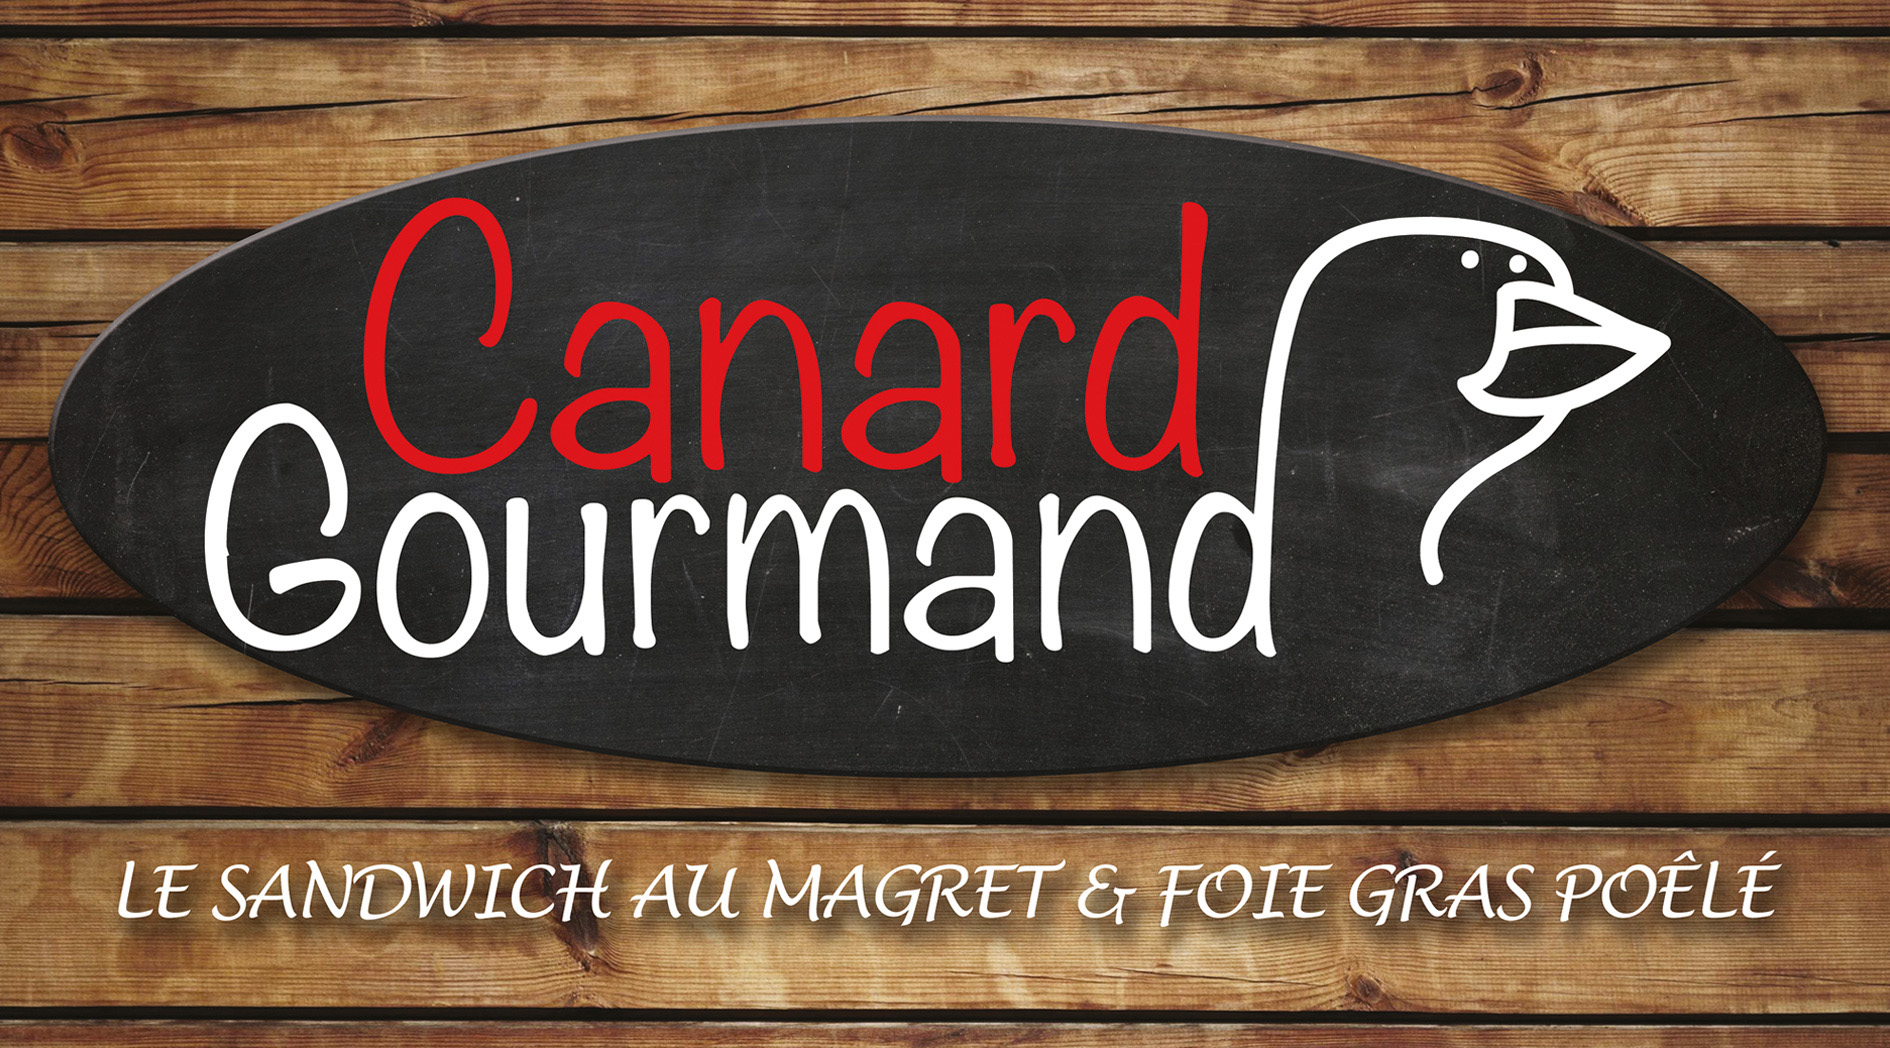 Canard Gourmand